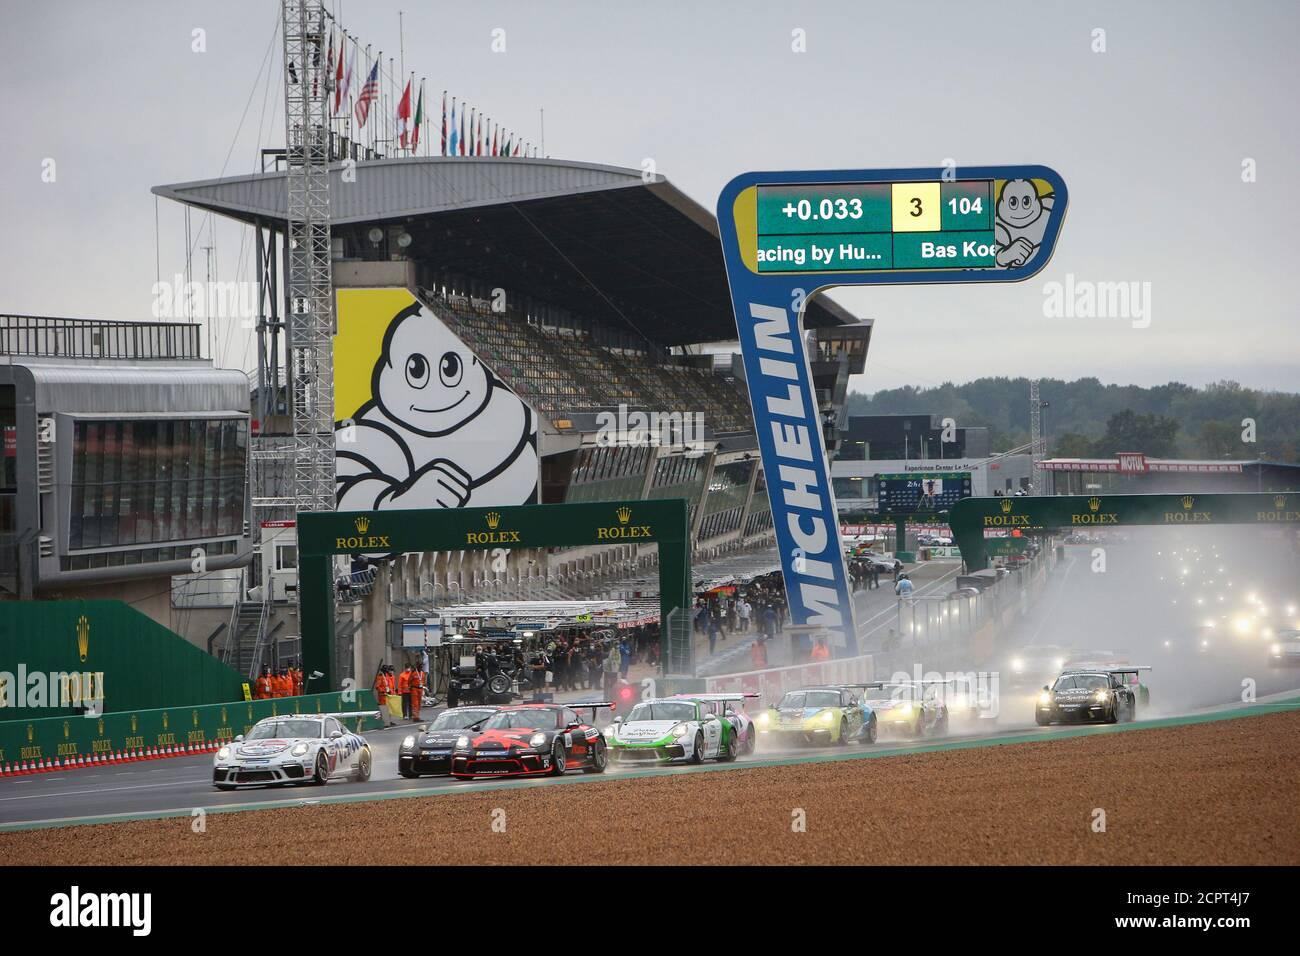 Le Mans, Francia. 19 de septiembre de 2020. 125 Larry Ten Voorde, Porsche 911 GT3 Cup, acción 104 Hartog Loek, Bas Koeten Racing, Porsche 911 GT3 Cup durante la Copa Porsche Carrera 2020 en el circuito des 24 Heures du Mans, del 18 al 19 de septiembre de 2020 en le Mans, Francia - Foto Thomas Fenetre / DPPI crédito: LM/DPPI/Thomas Fenetre/Alamy Live News crédito: Gruppo Editoriale LiveMedia/Alamy Live News Foto de stock